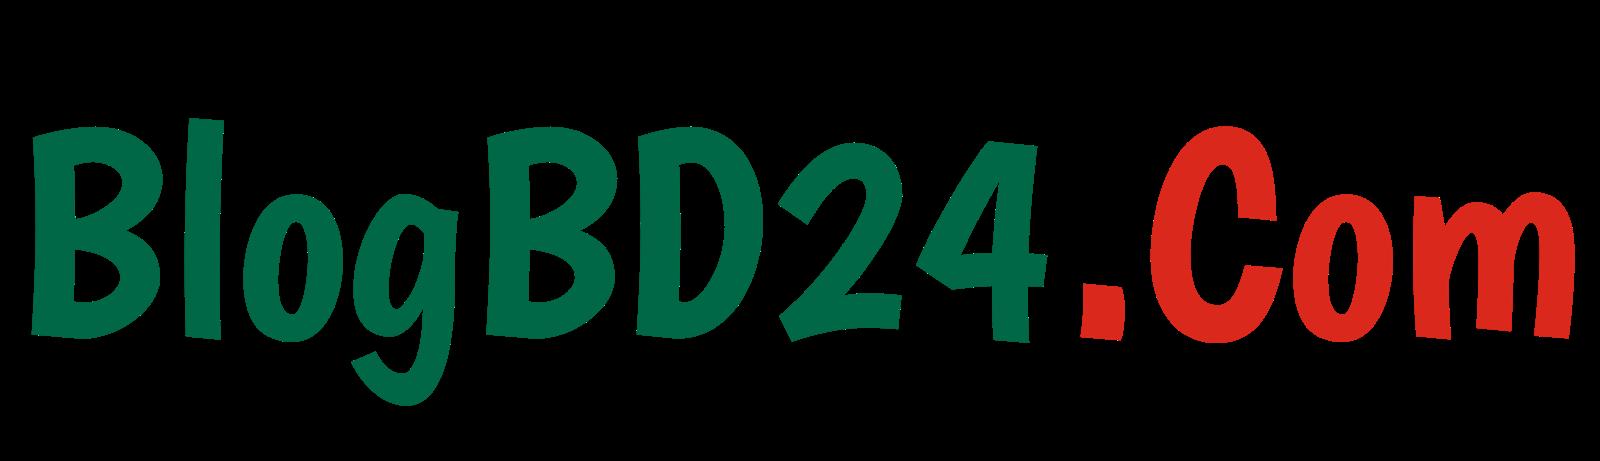 BlogBD24.Com